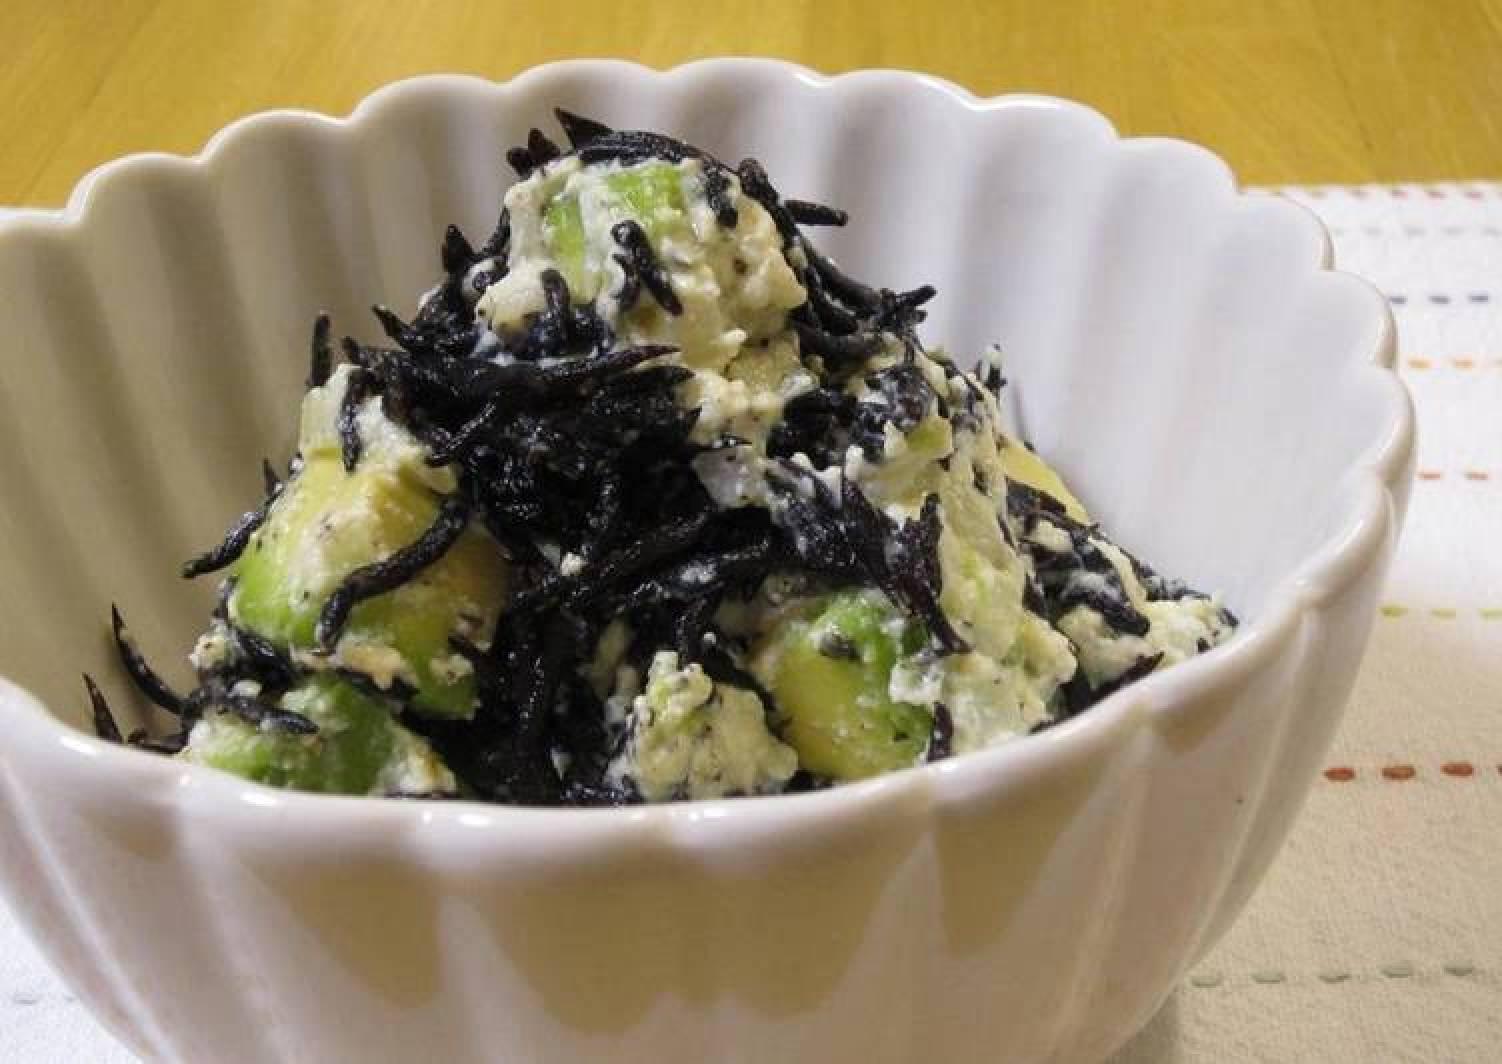 Hijiki Seaweed & Avocado Western-Style Dressing